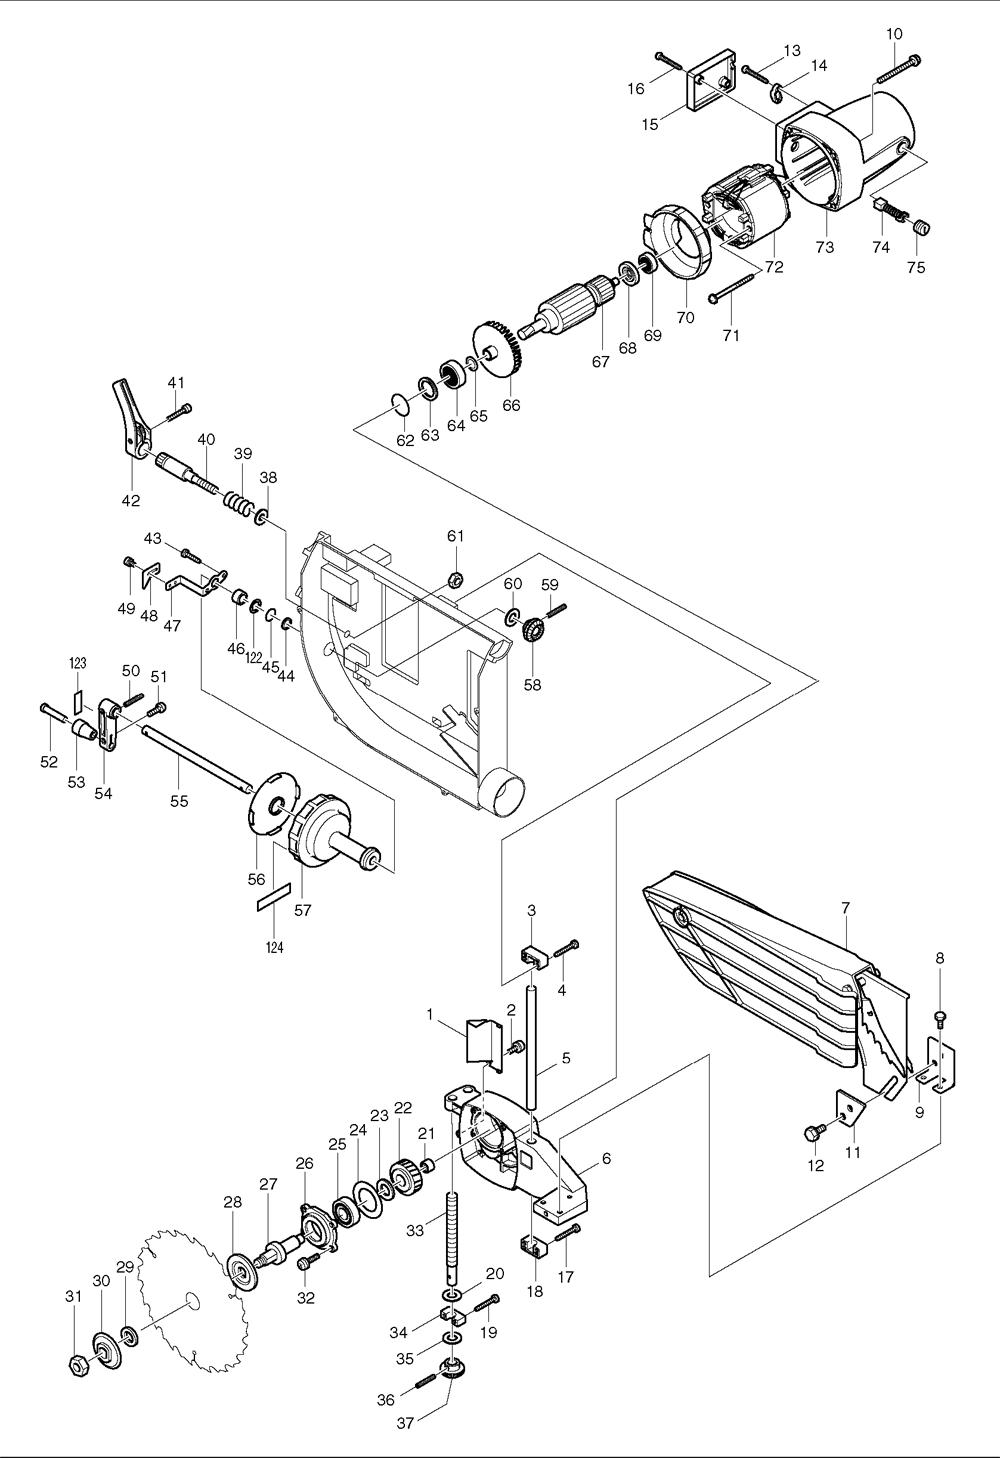 makitum jr3000v switch wiring diagram makita jr3000v switch wiring 2003 VW Beetle Stereo Wiring medium resolution of makita jr3000v wiring diagram wiring diagrams data base pass seymour wiring diagrams makita